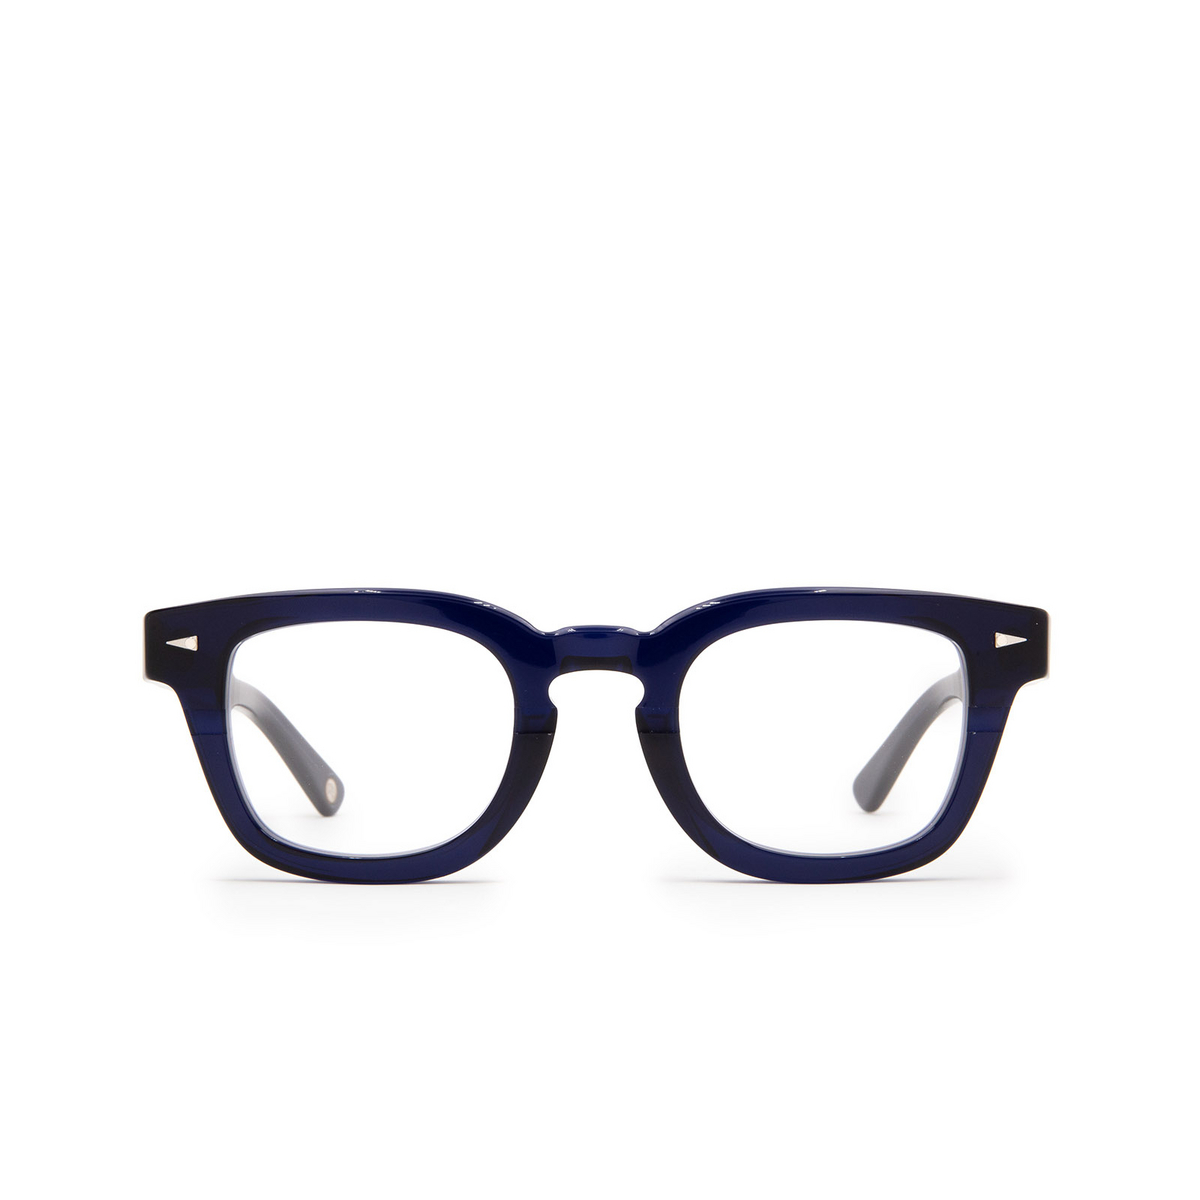 Ahlem® Square Eyeglasses: Champ De Mars Optic color Blue Light.